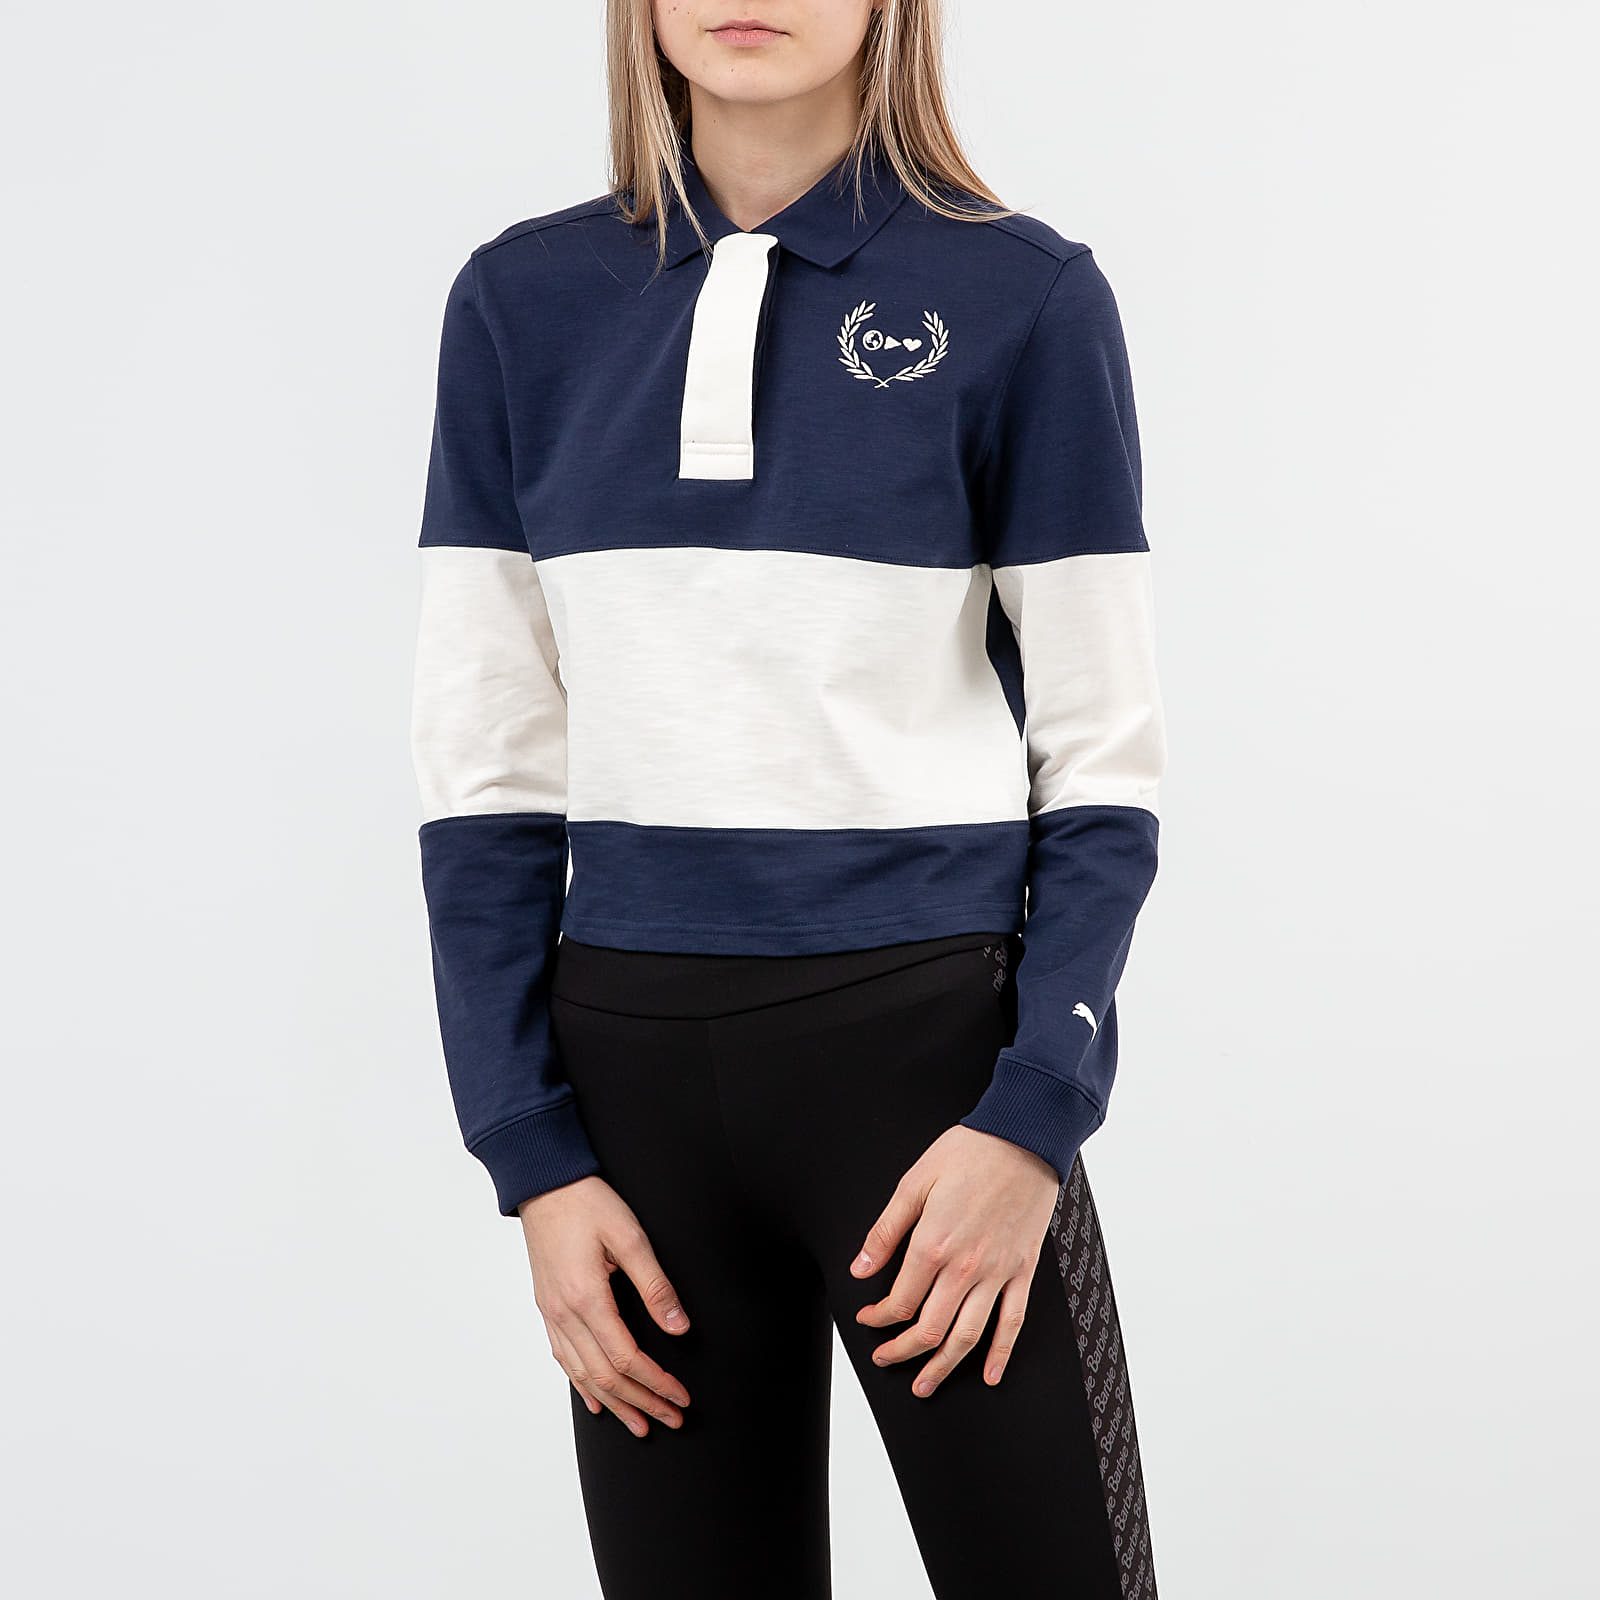 T-shirts Puma x Selena Gomez Rugby Polo Tee Peacoat/ Whisper White